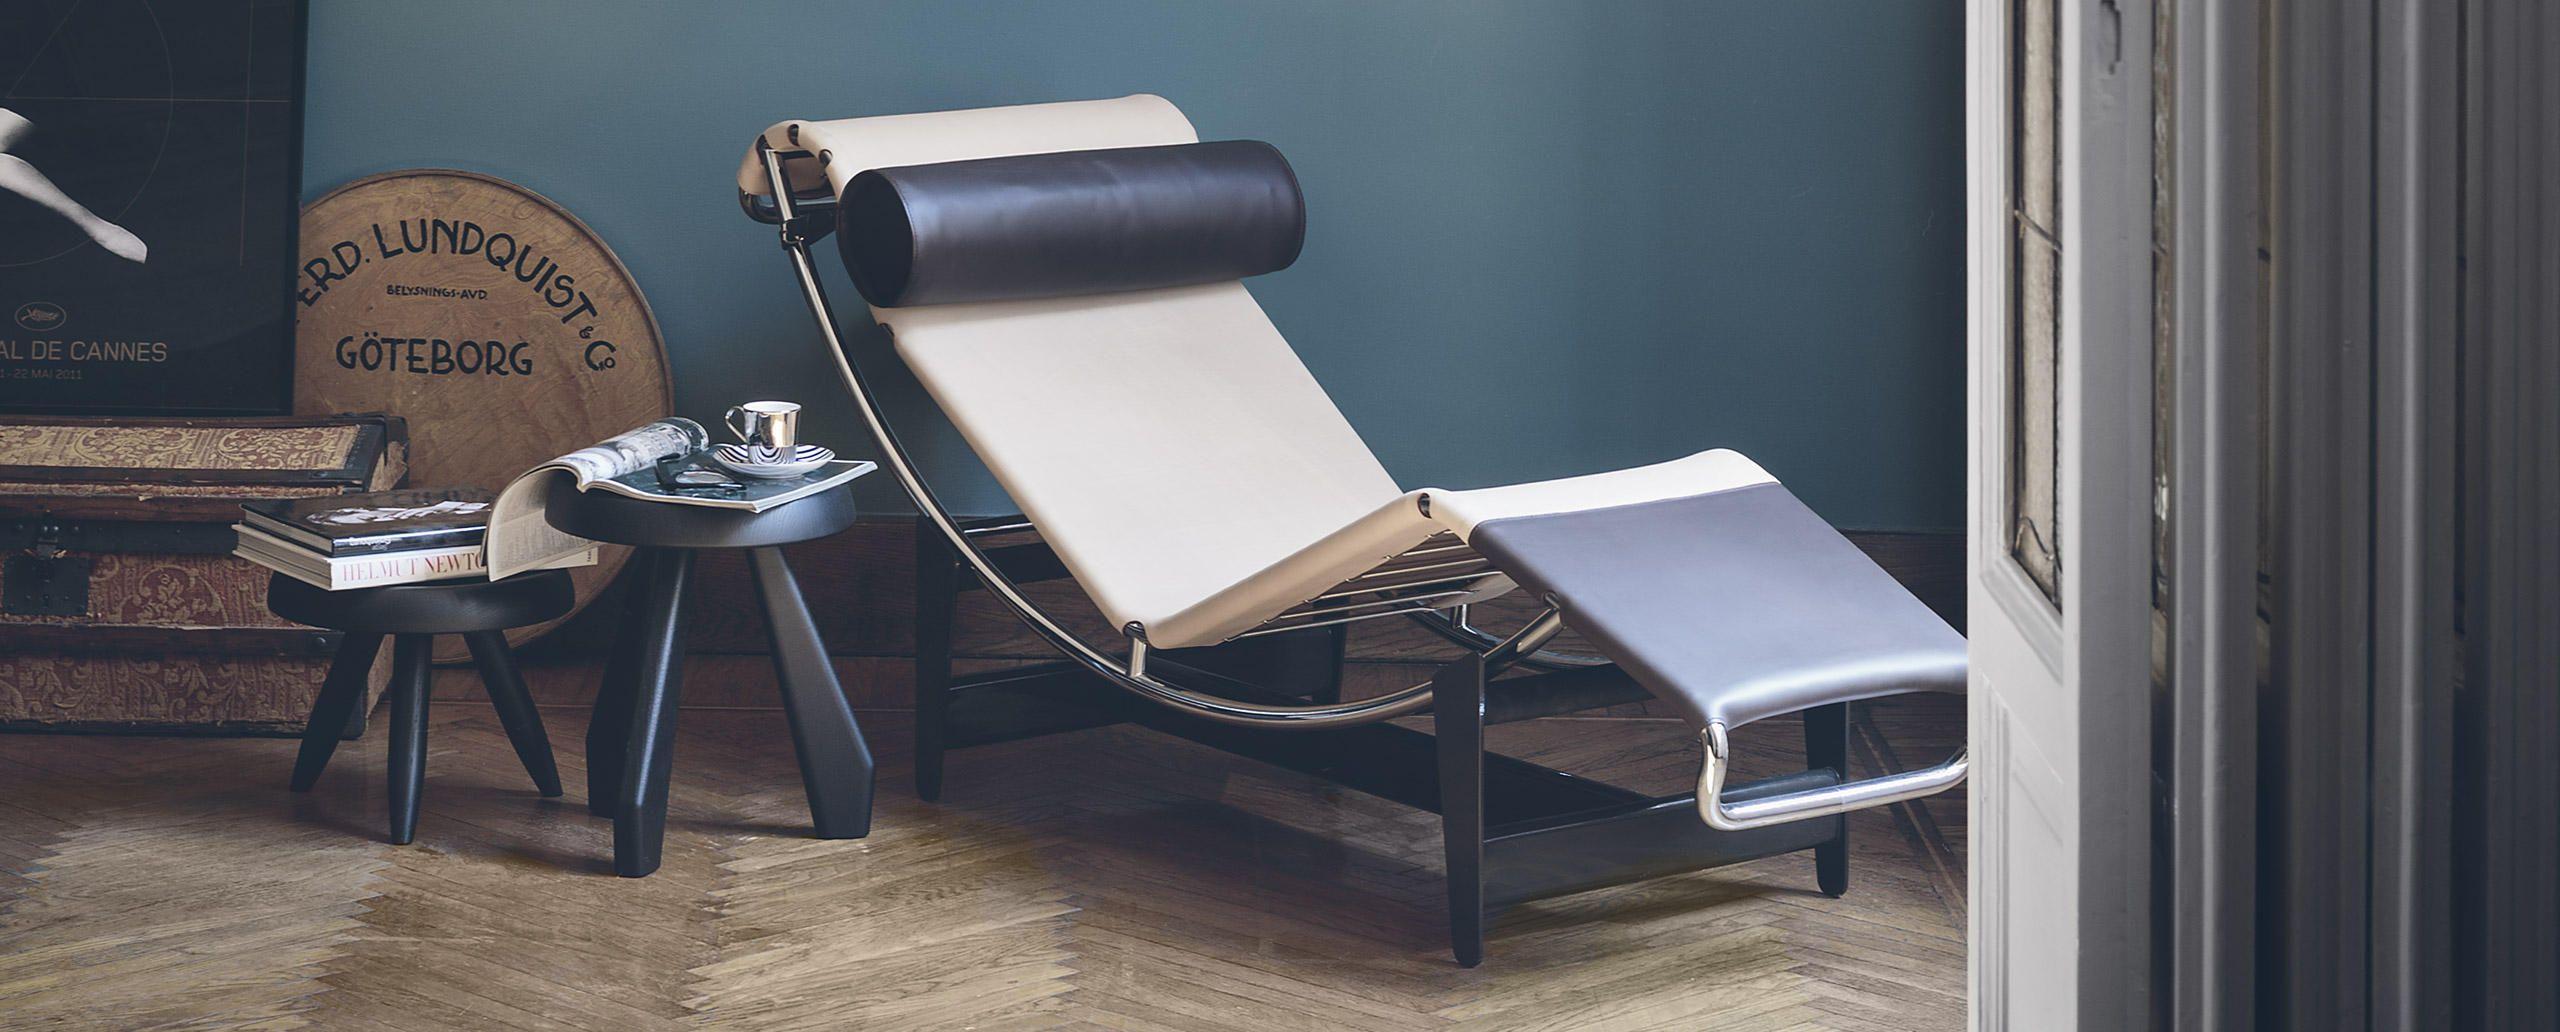 chaise longue alternatives